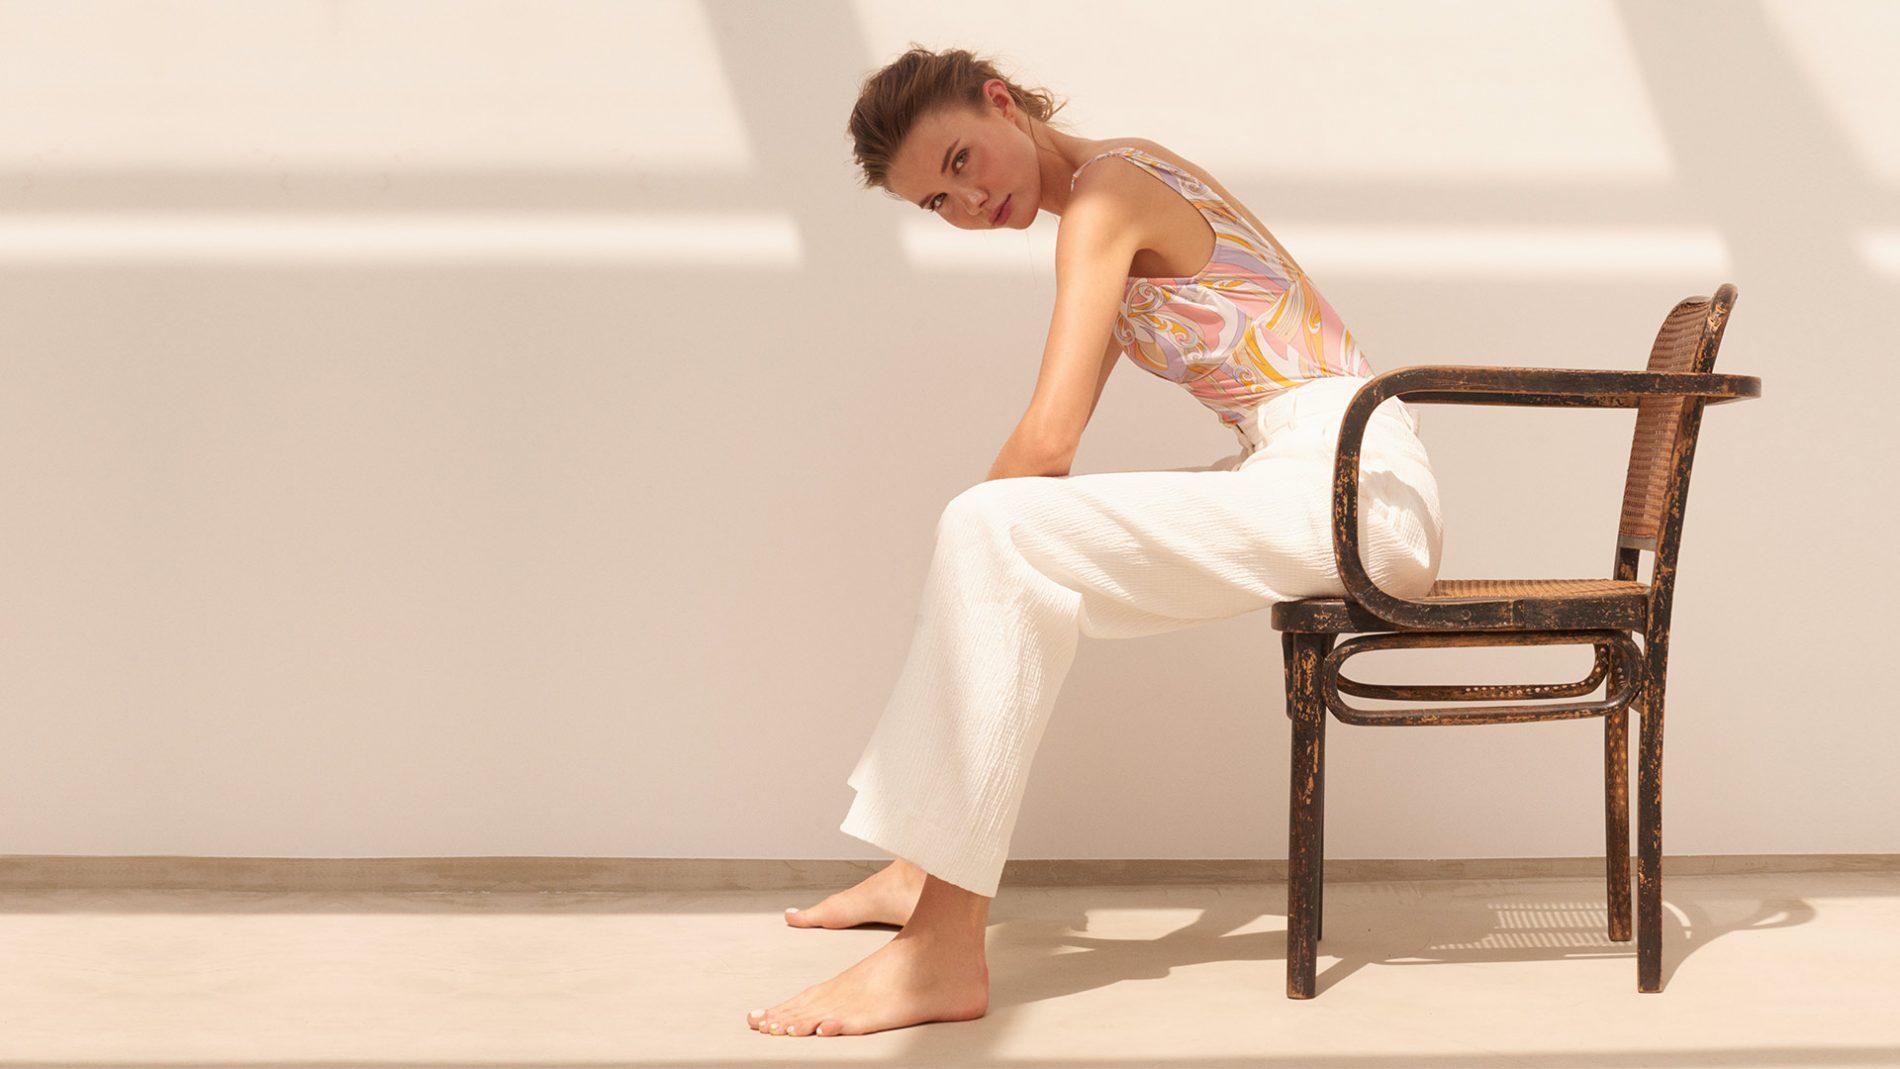 El Corte Inglés Designer Swimwear Pucci Swimsuit Victoria Beckham